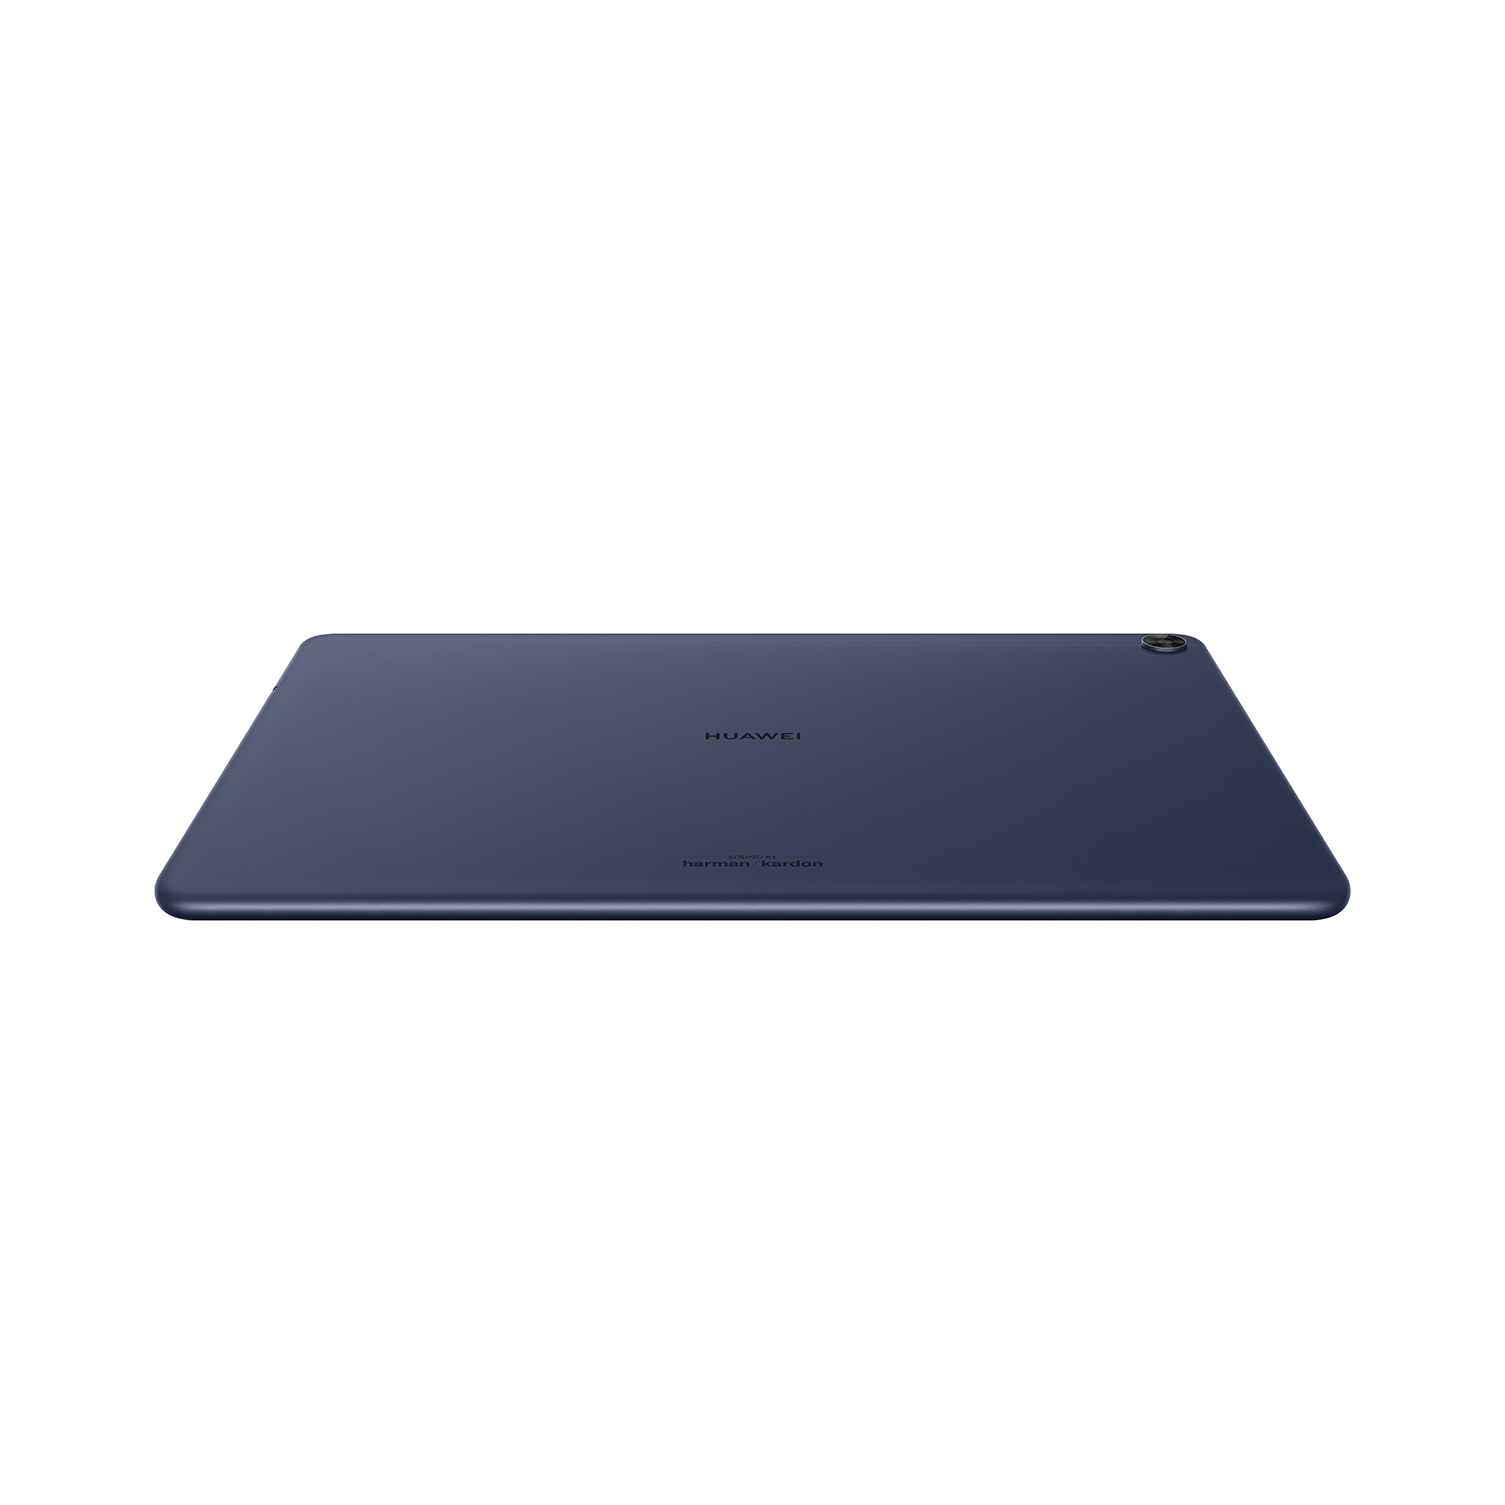 MatePad T10s (1)